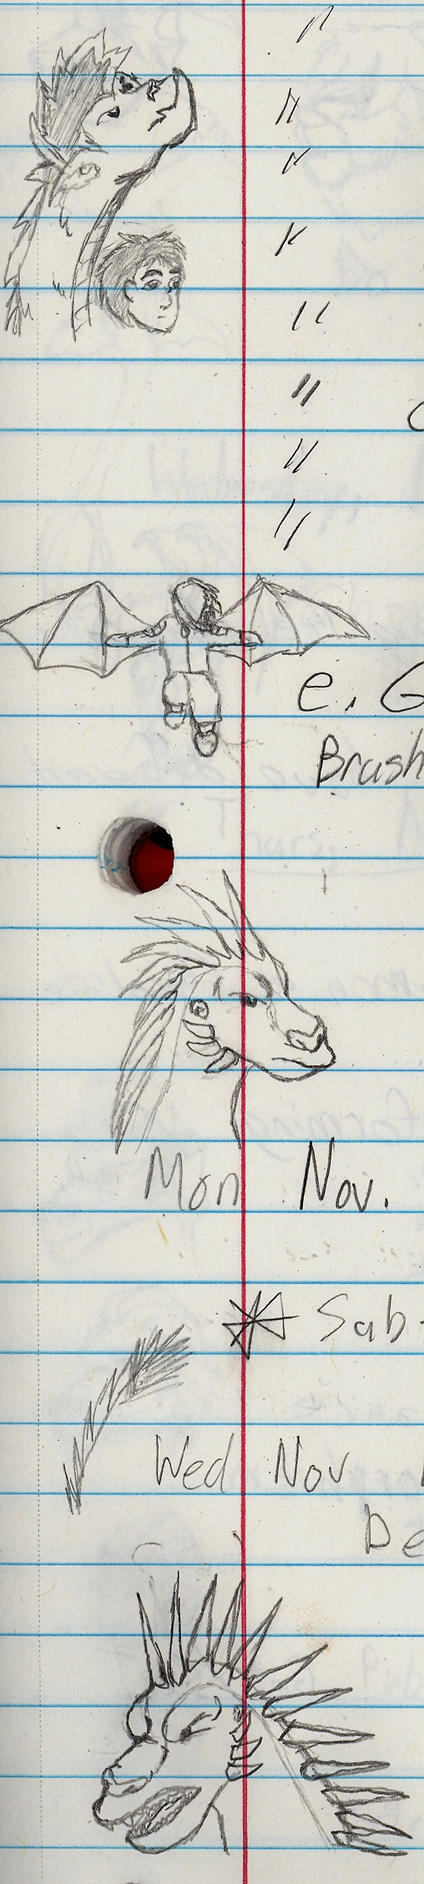 Sketch Dump 24 of 29 by Quachir